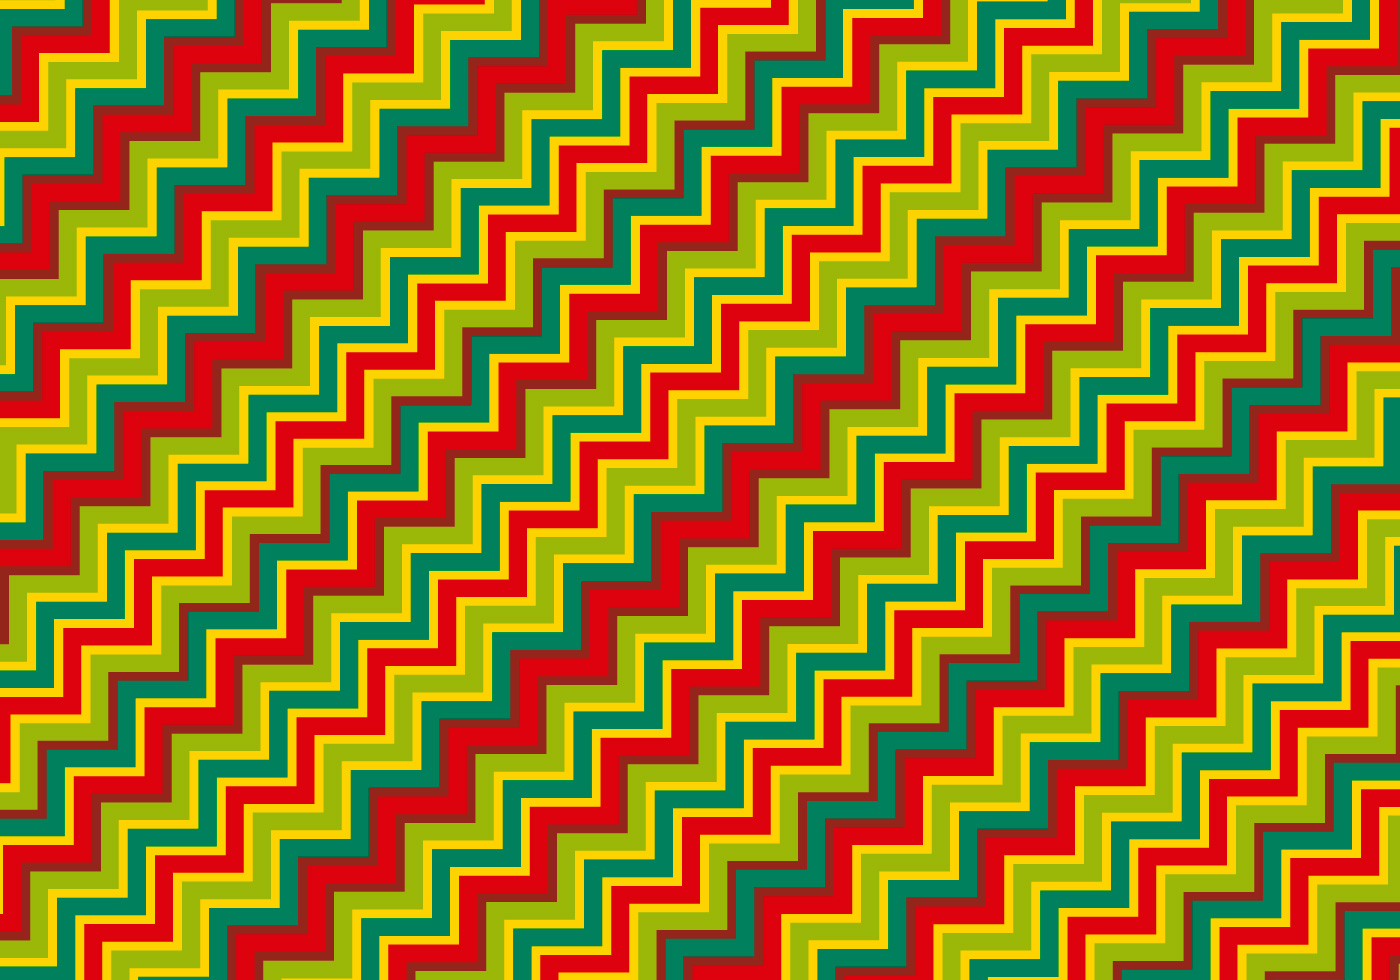 colorful zig zag pattern background download free vector art stock graphics images. Black Bedroom Furniture Sets. Home Design Ideas